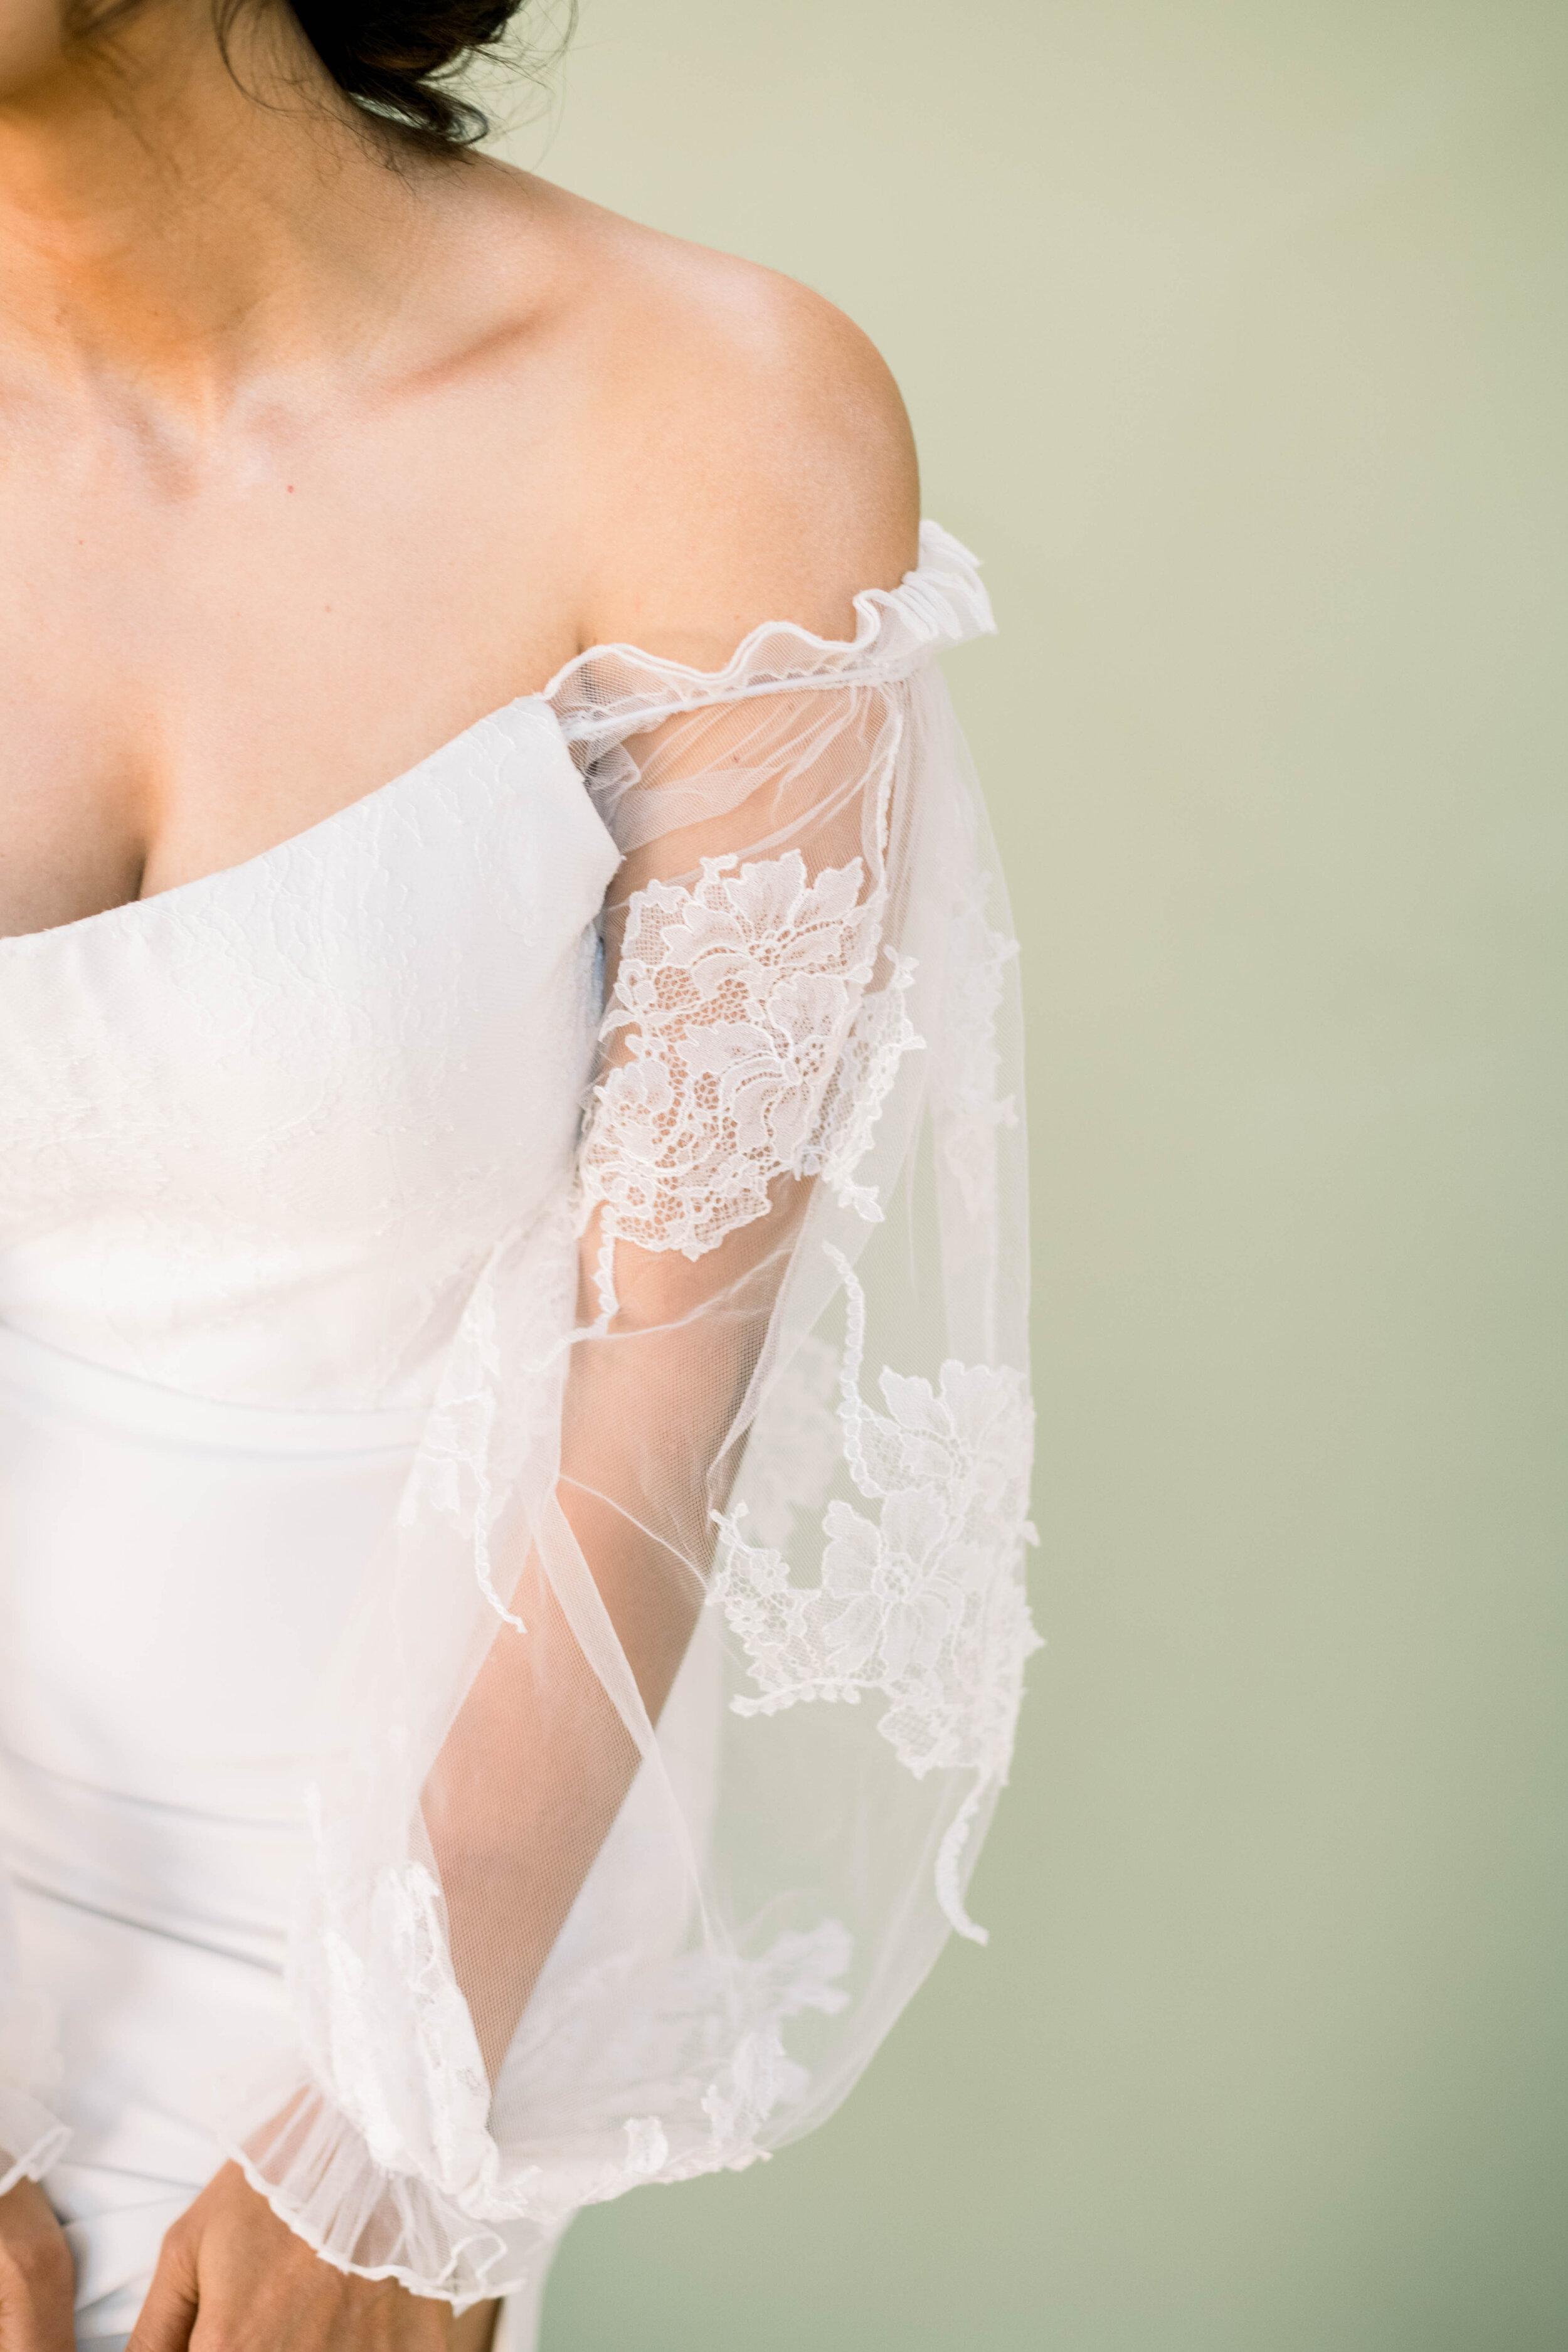 bridal portraits+high fashion+couture bridal gown+alonlivne+vera wang wedding dress+nyc bride+bridal shoot+bridal editorial+photo